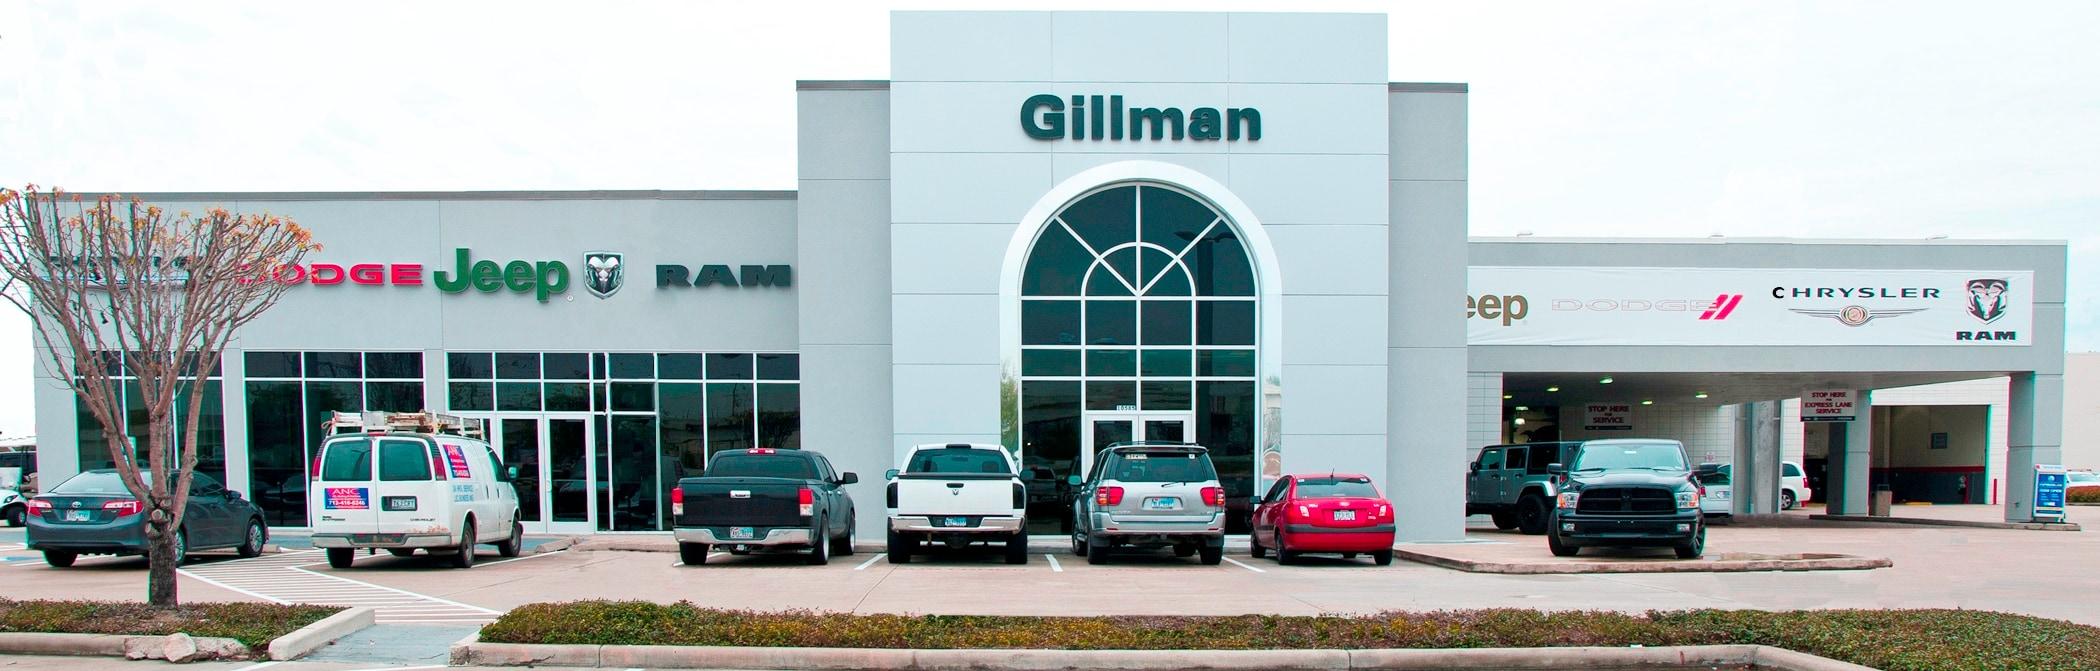 Gillman Chrysler Jeep Dodge RAM: New & Used Car Dealer | Houston, TX